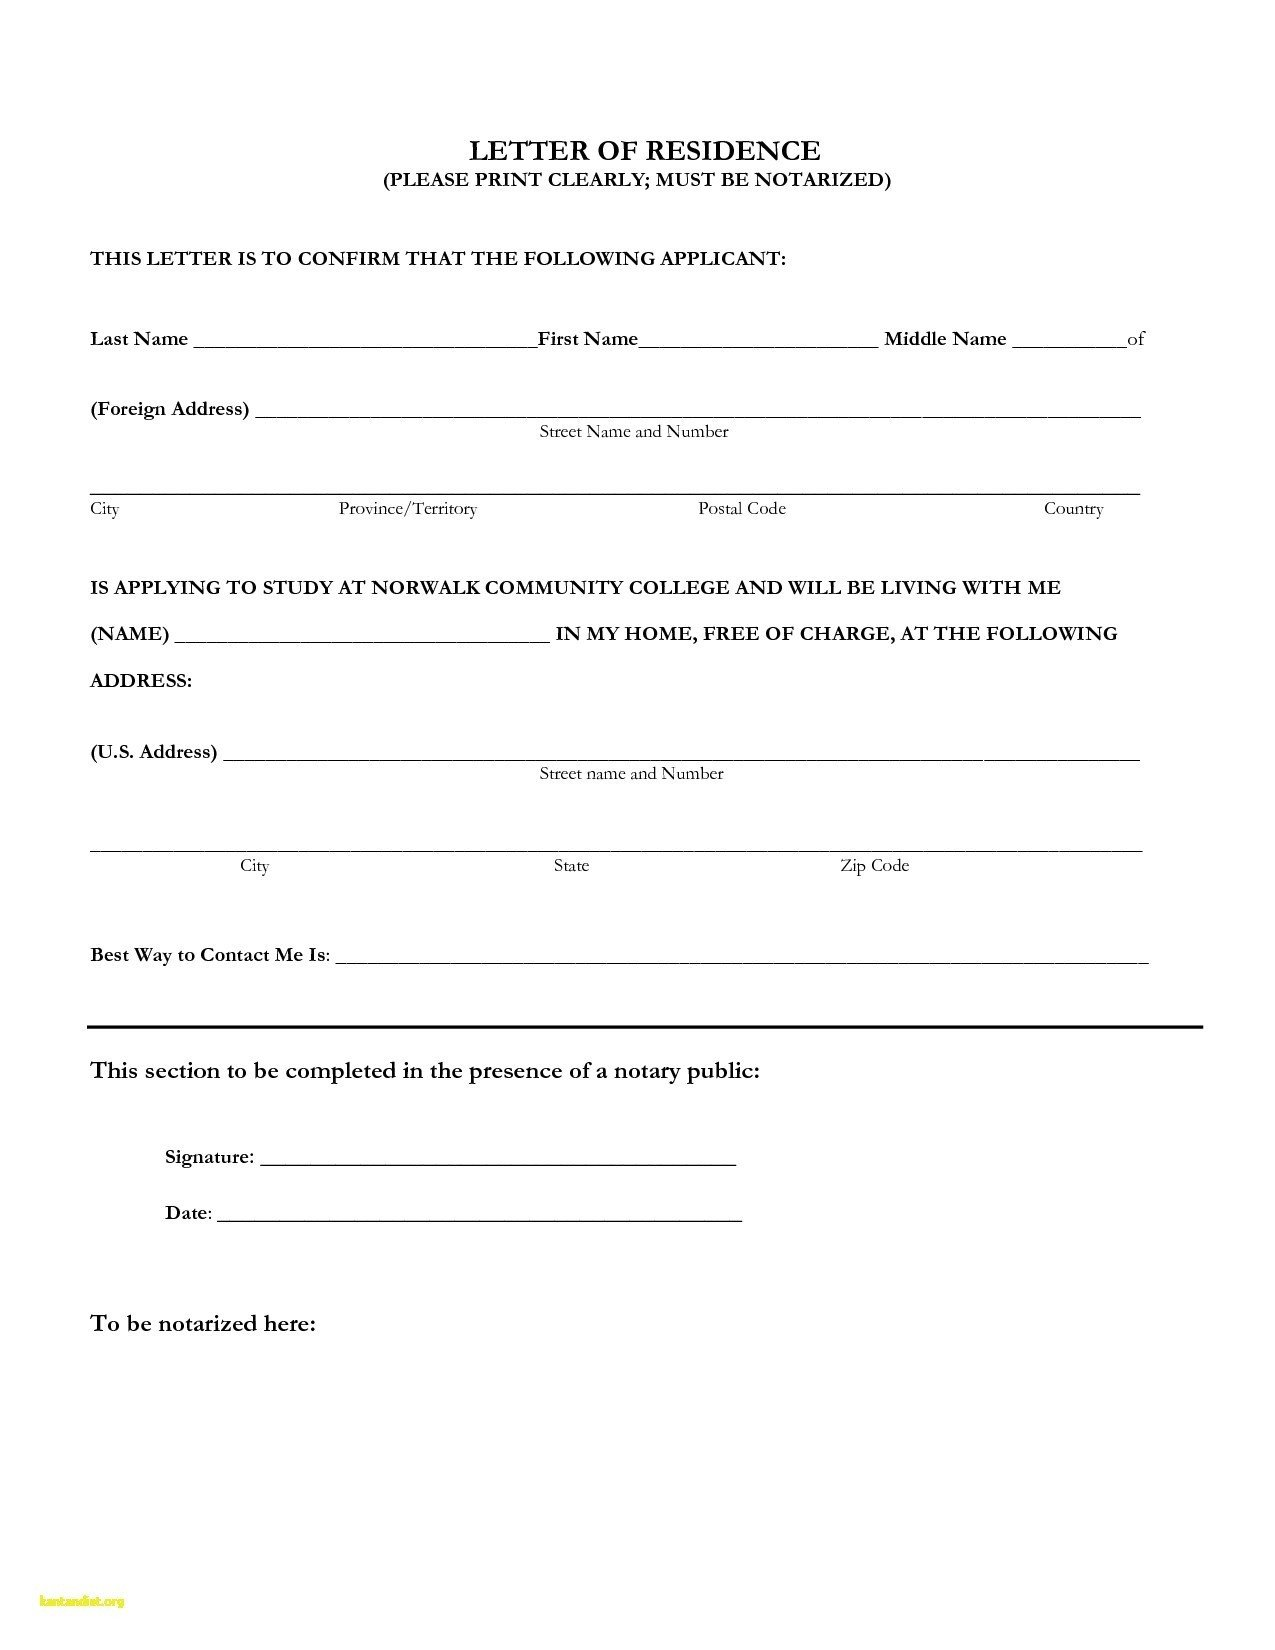 Notarized Letter Of Residency Notarized Proof Residency Template Flowersheet